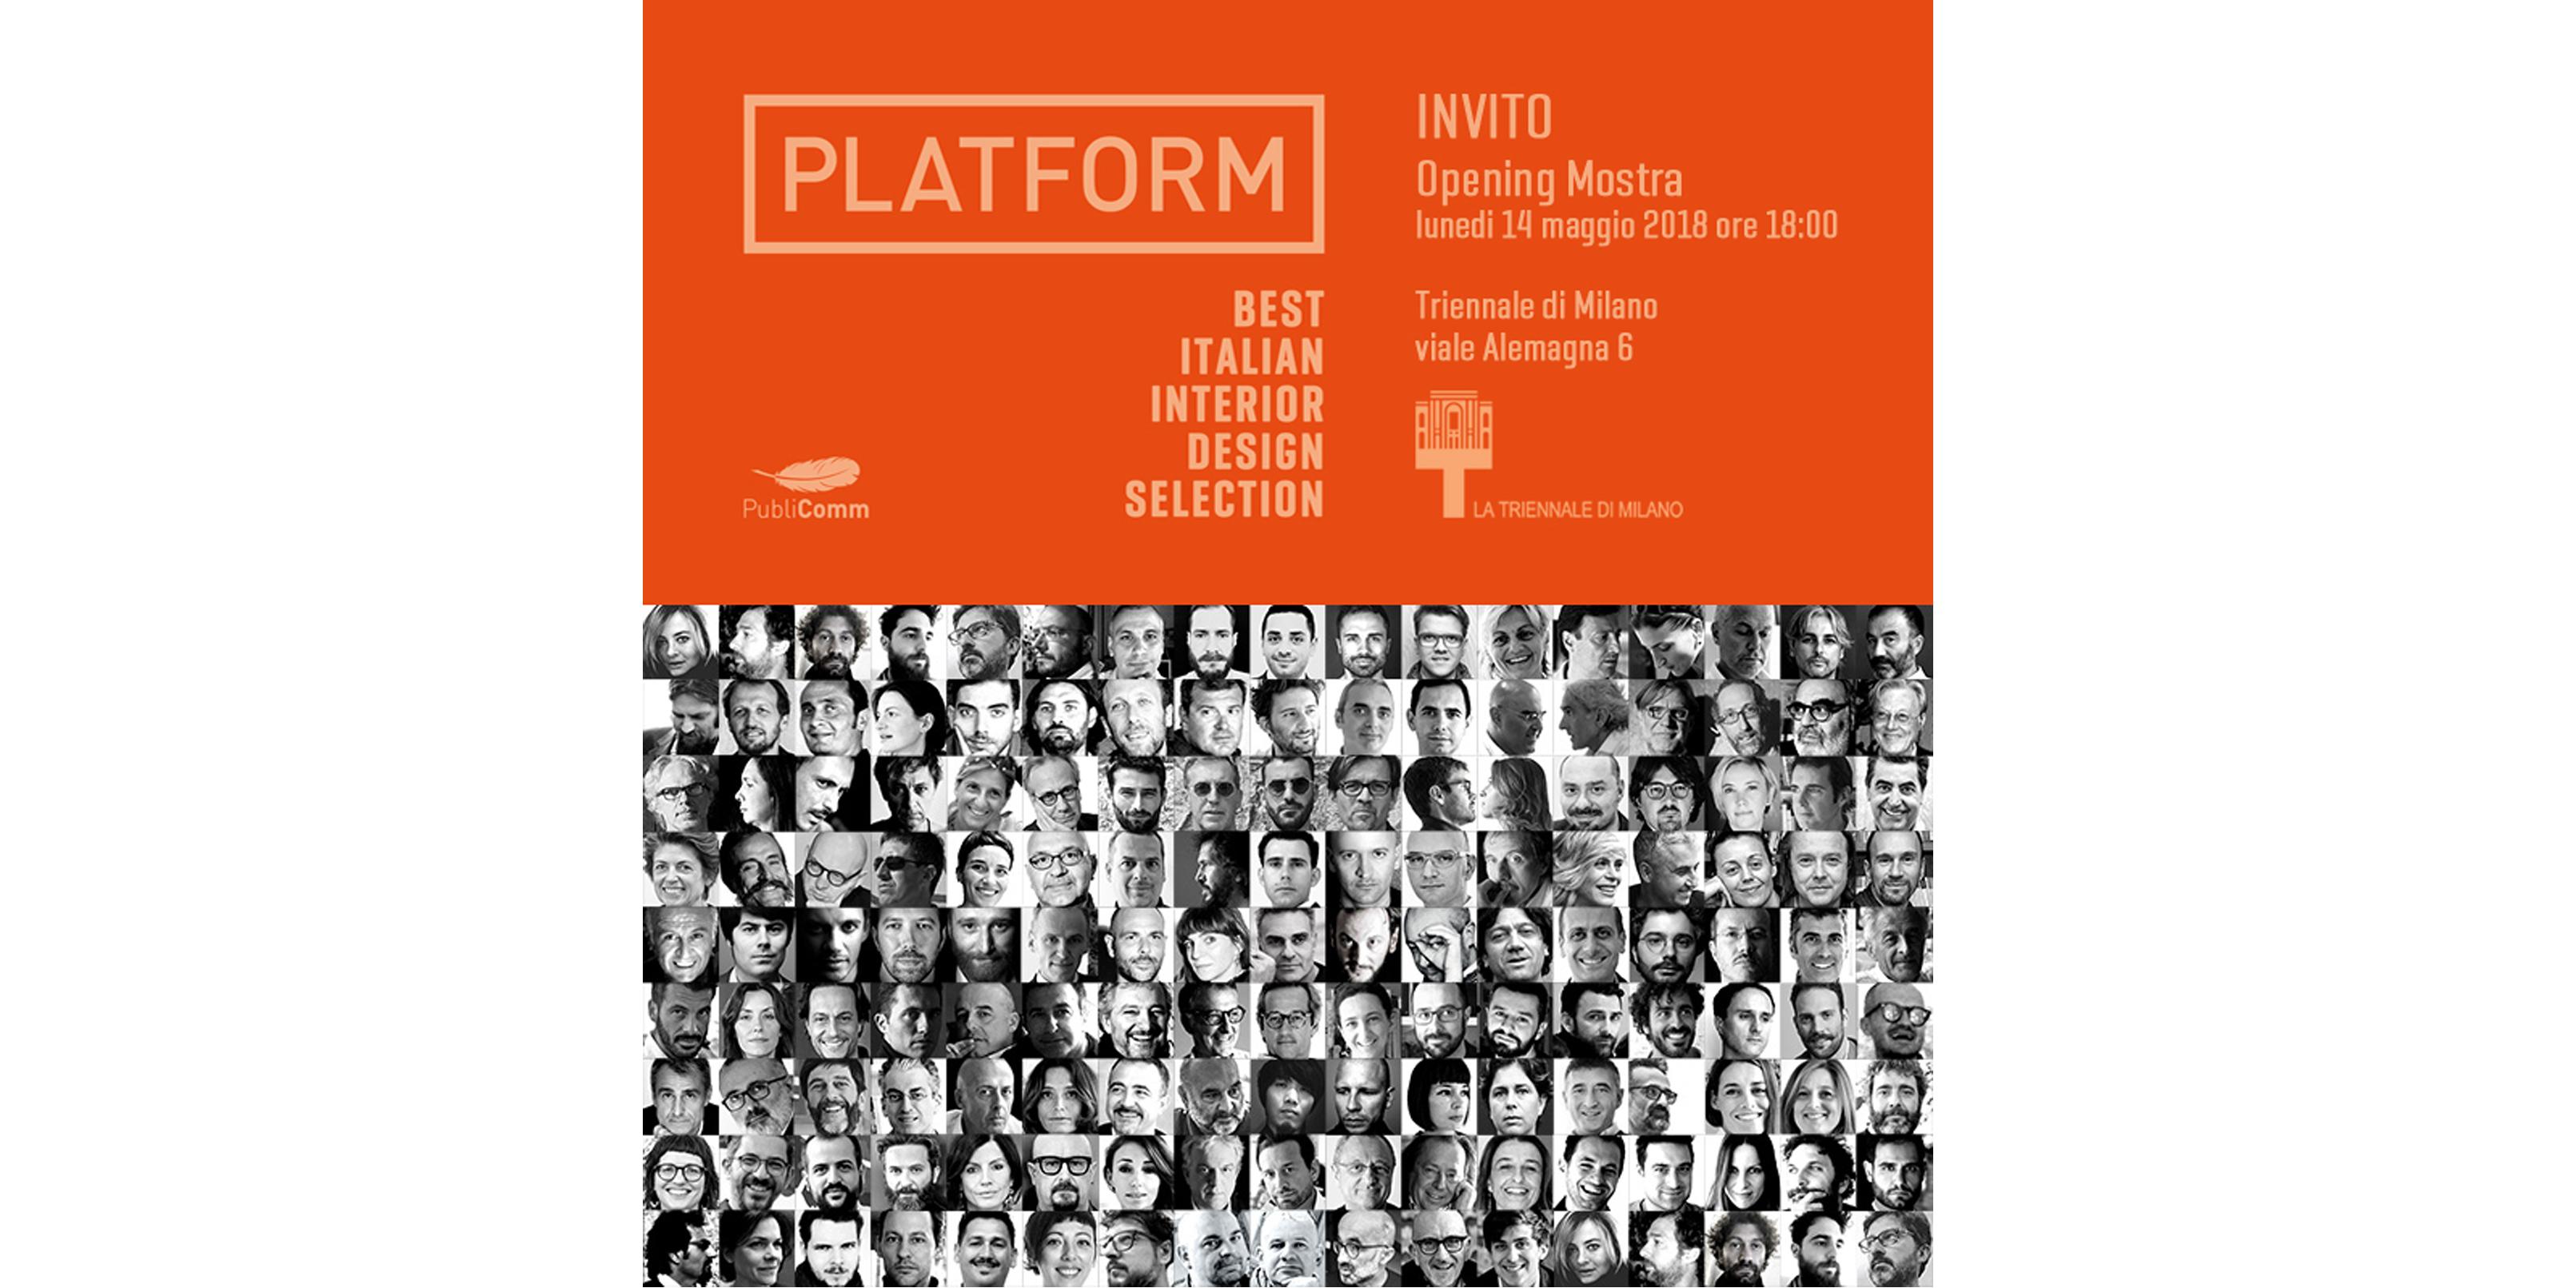 Mostra Design Milano 2018 platform • best italian interior design selection – pls design